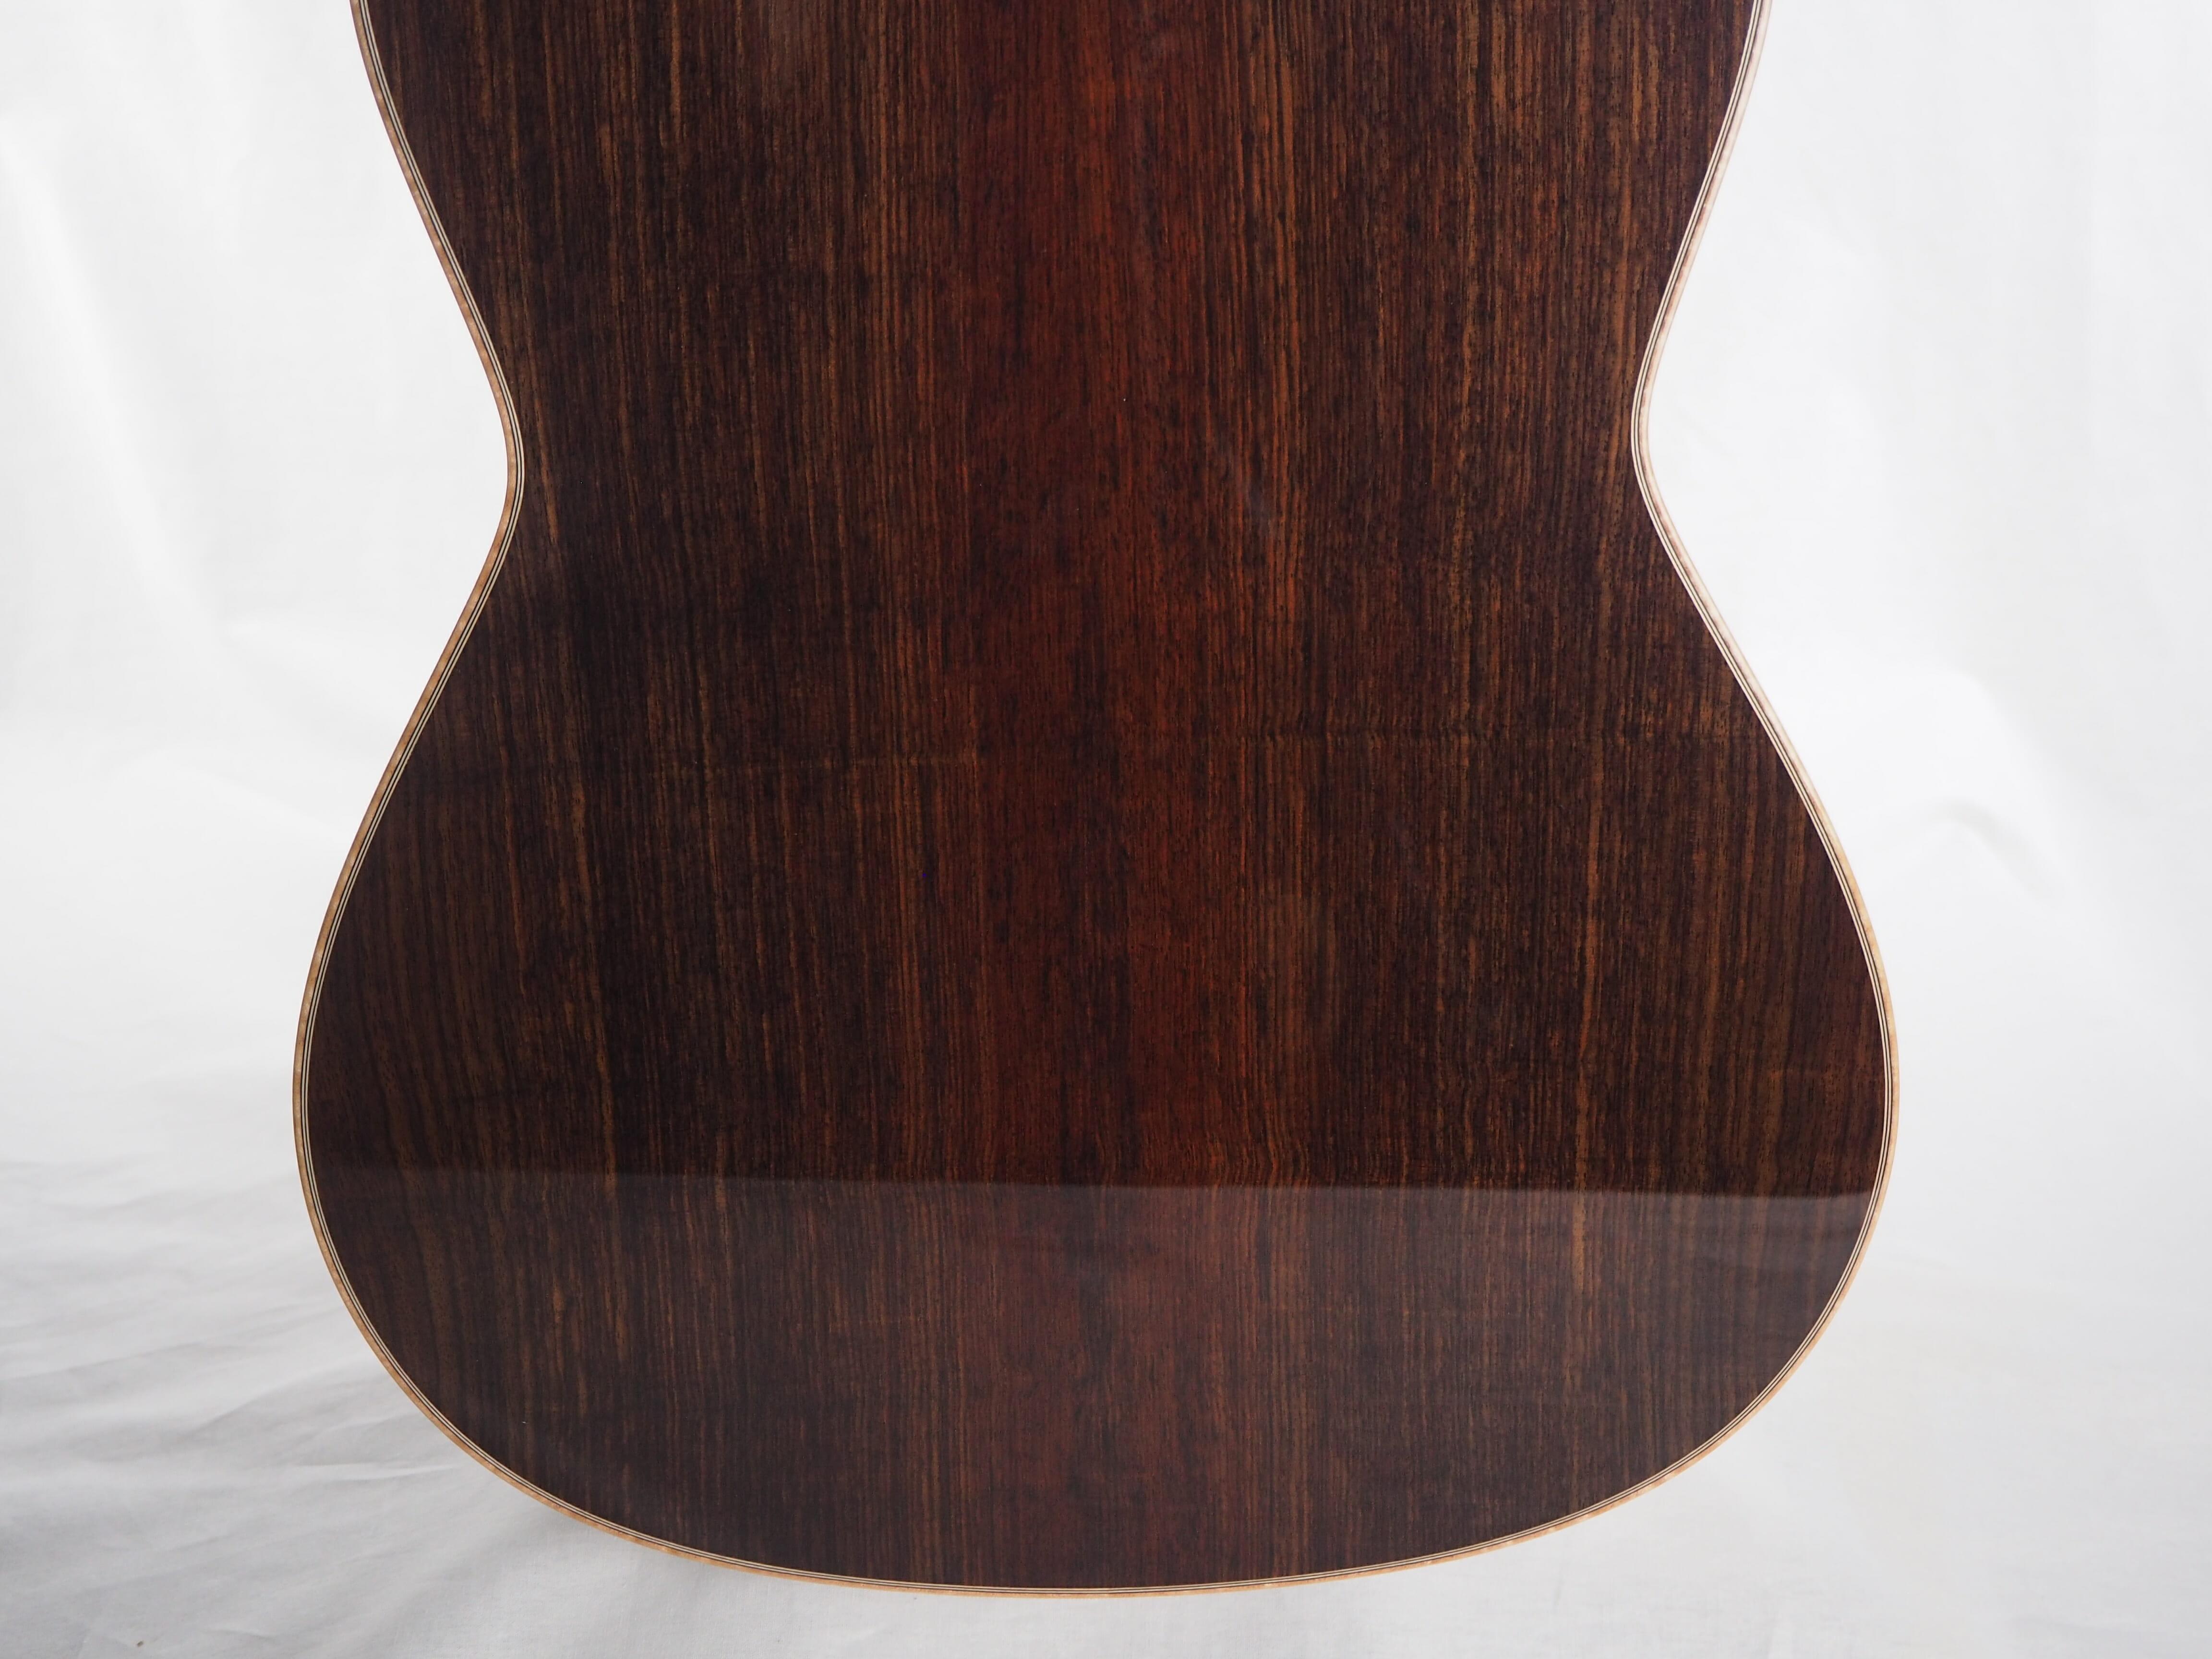 Martin Blackwell n°141 2017-01 – guitare classique de luthier double-table